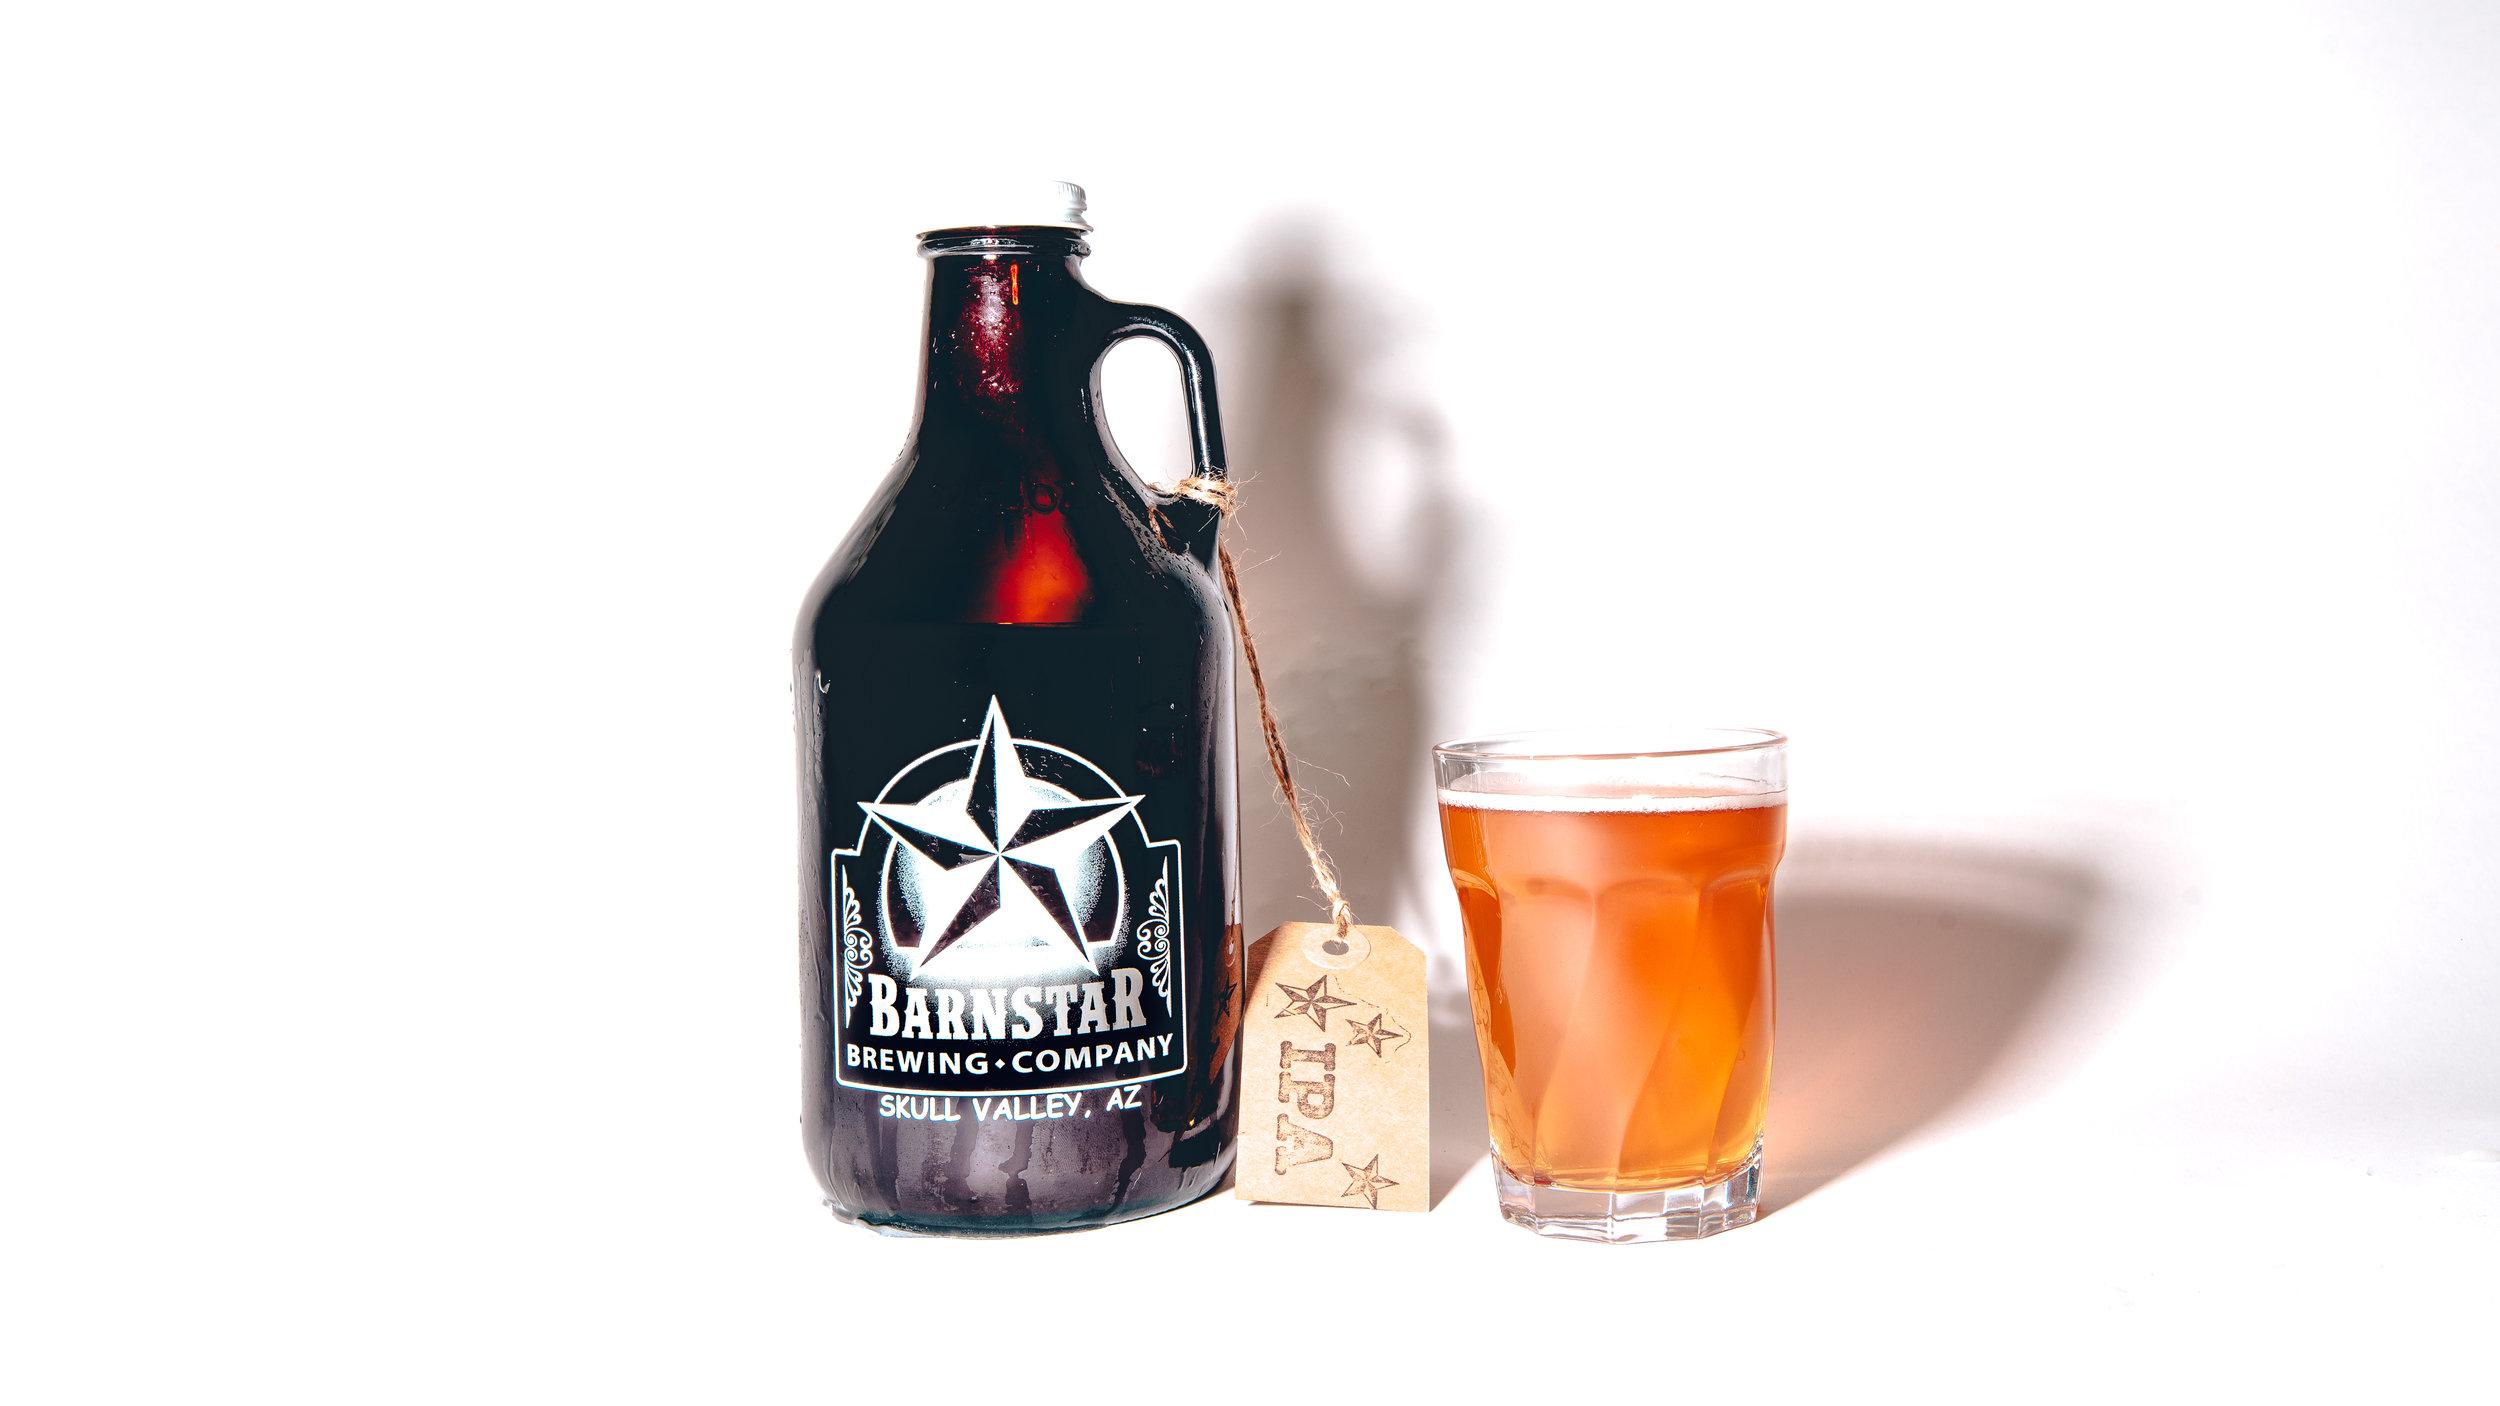 BarnStar Brewery